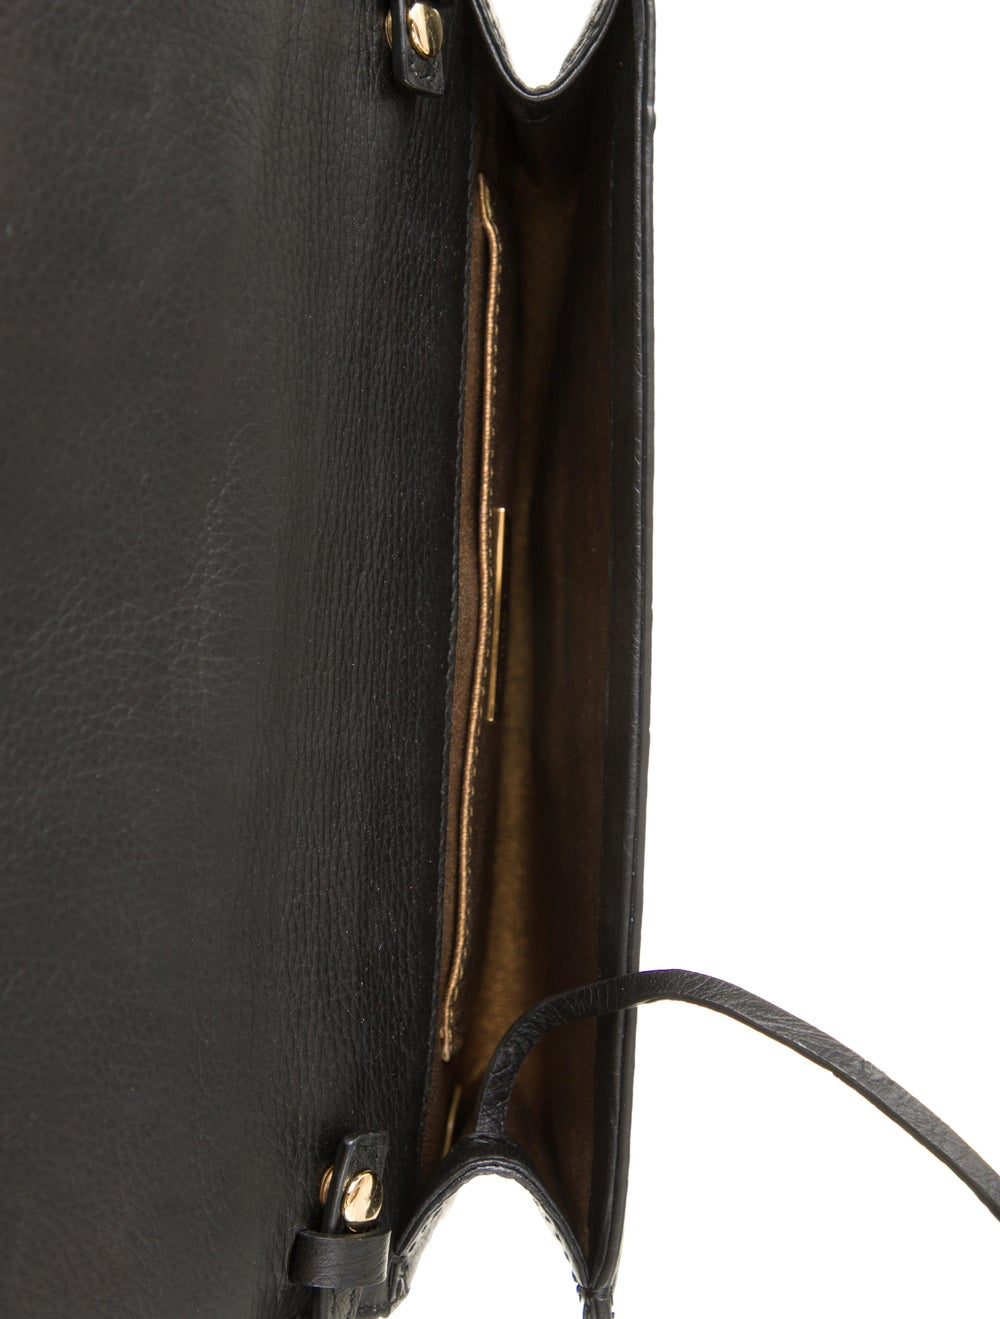 Michael Kors Embossed Leather Bag Black - image 5